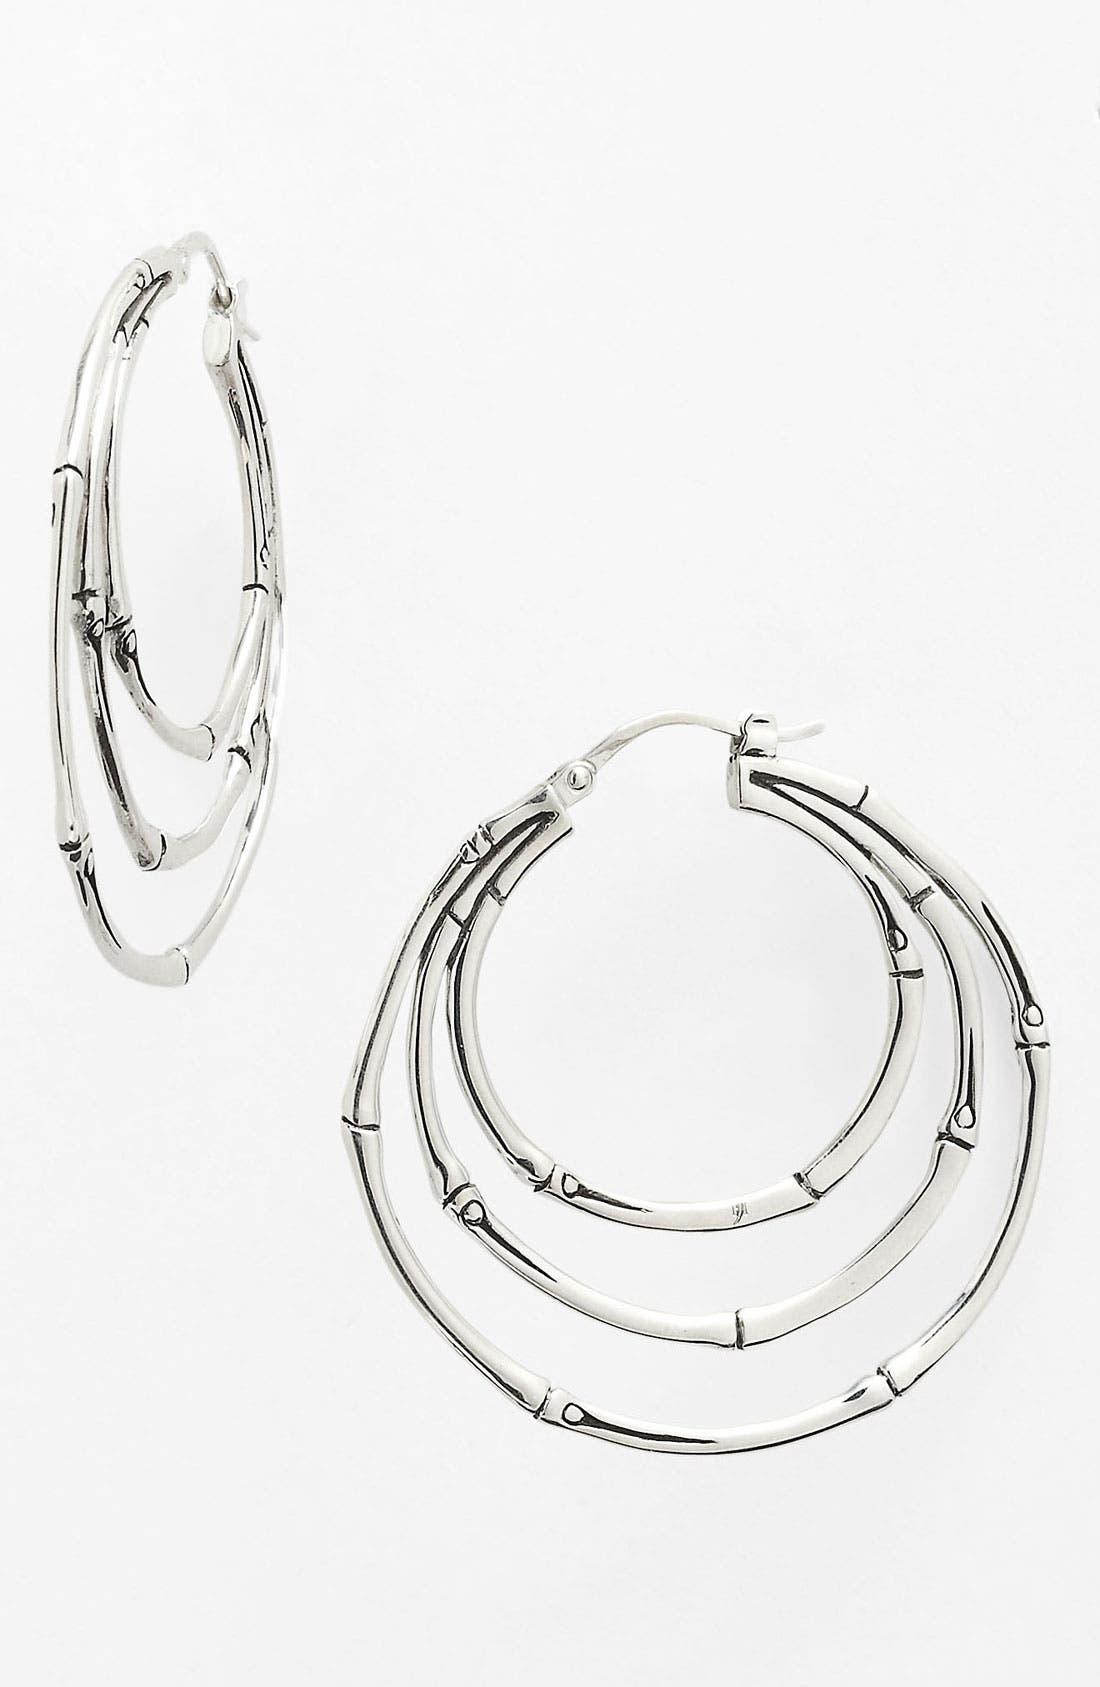 Alternate Image 1 Selected - John Hardy 'Bamboo' Small Orbital Hoop Earrings